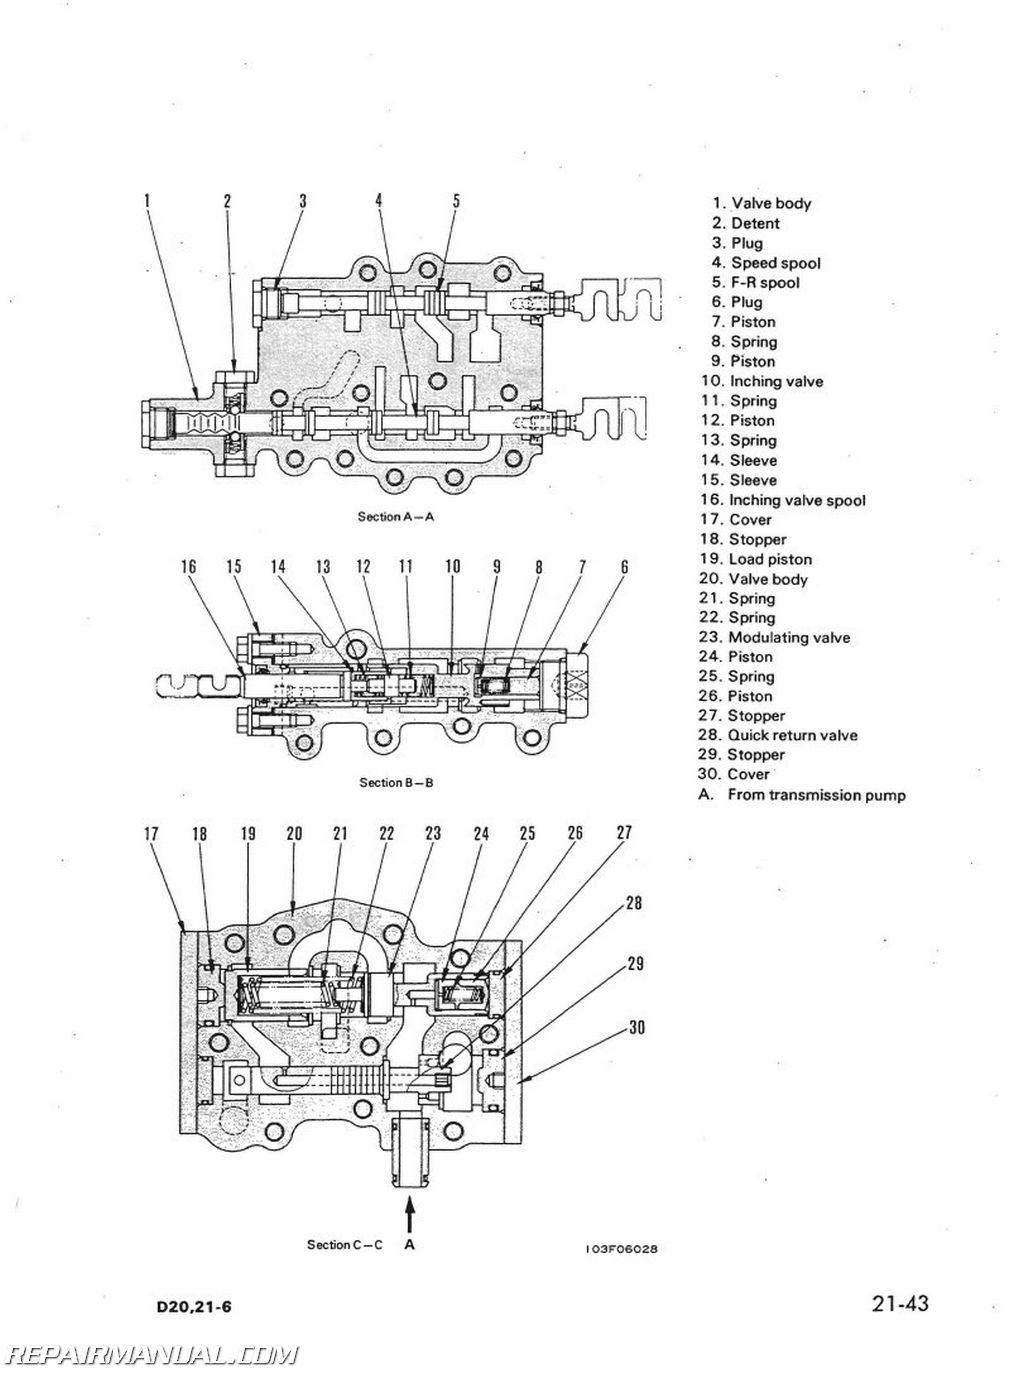 komatsu d20 d21 d31 d37 chassis only service manual repair komatsu d20 d21 d31 d37 chassis only service manual page 3